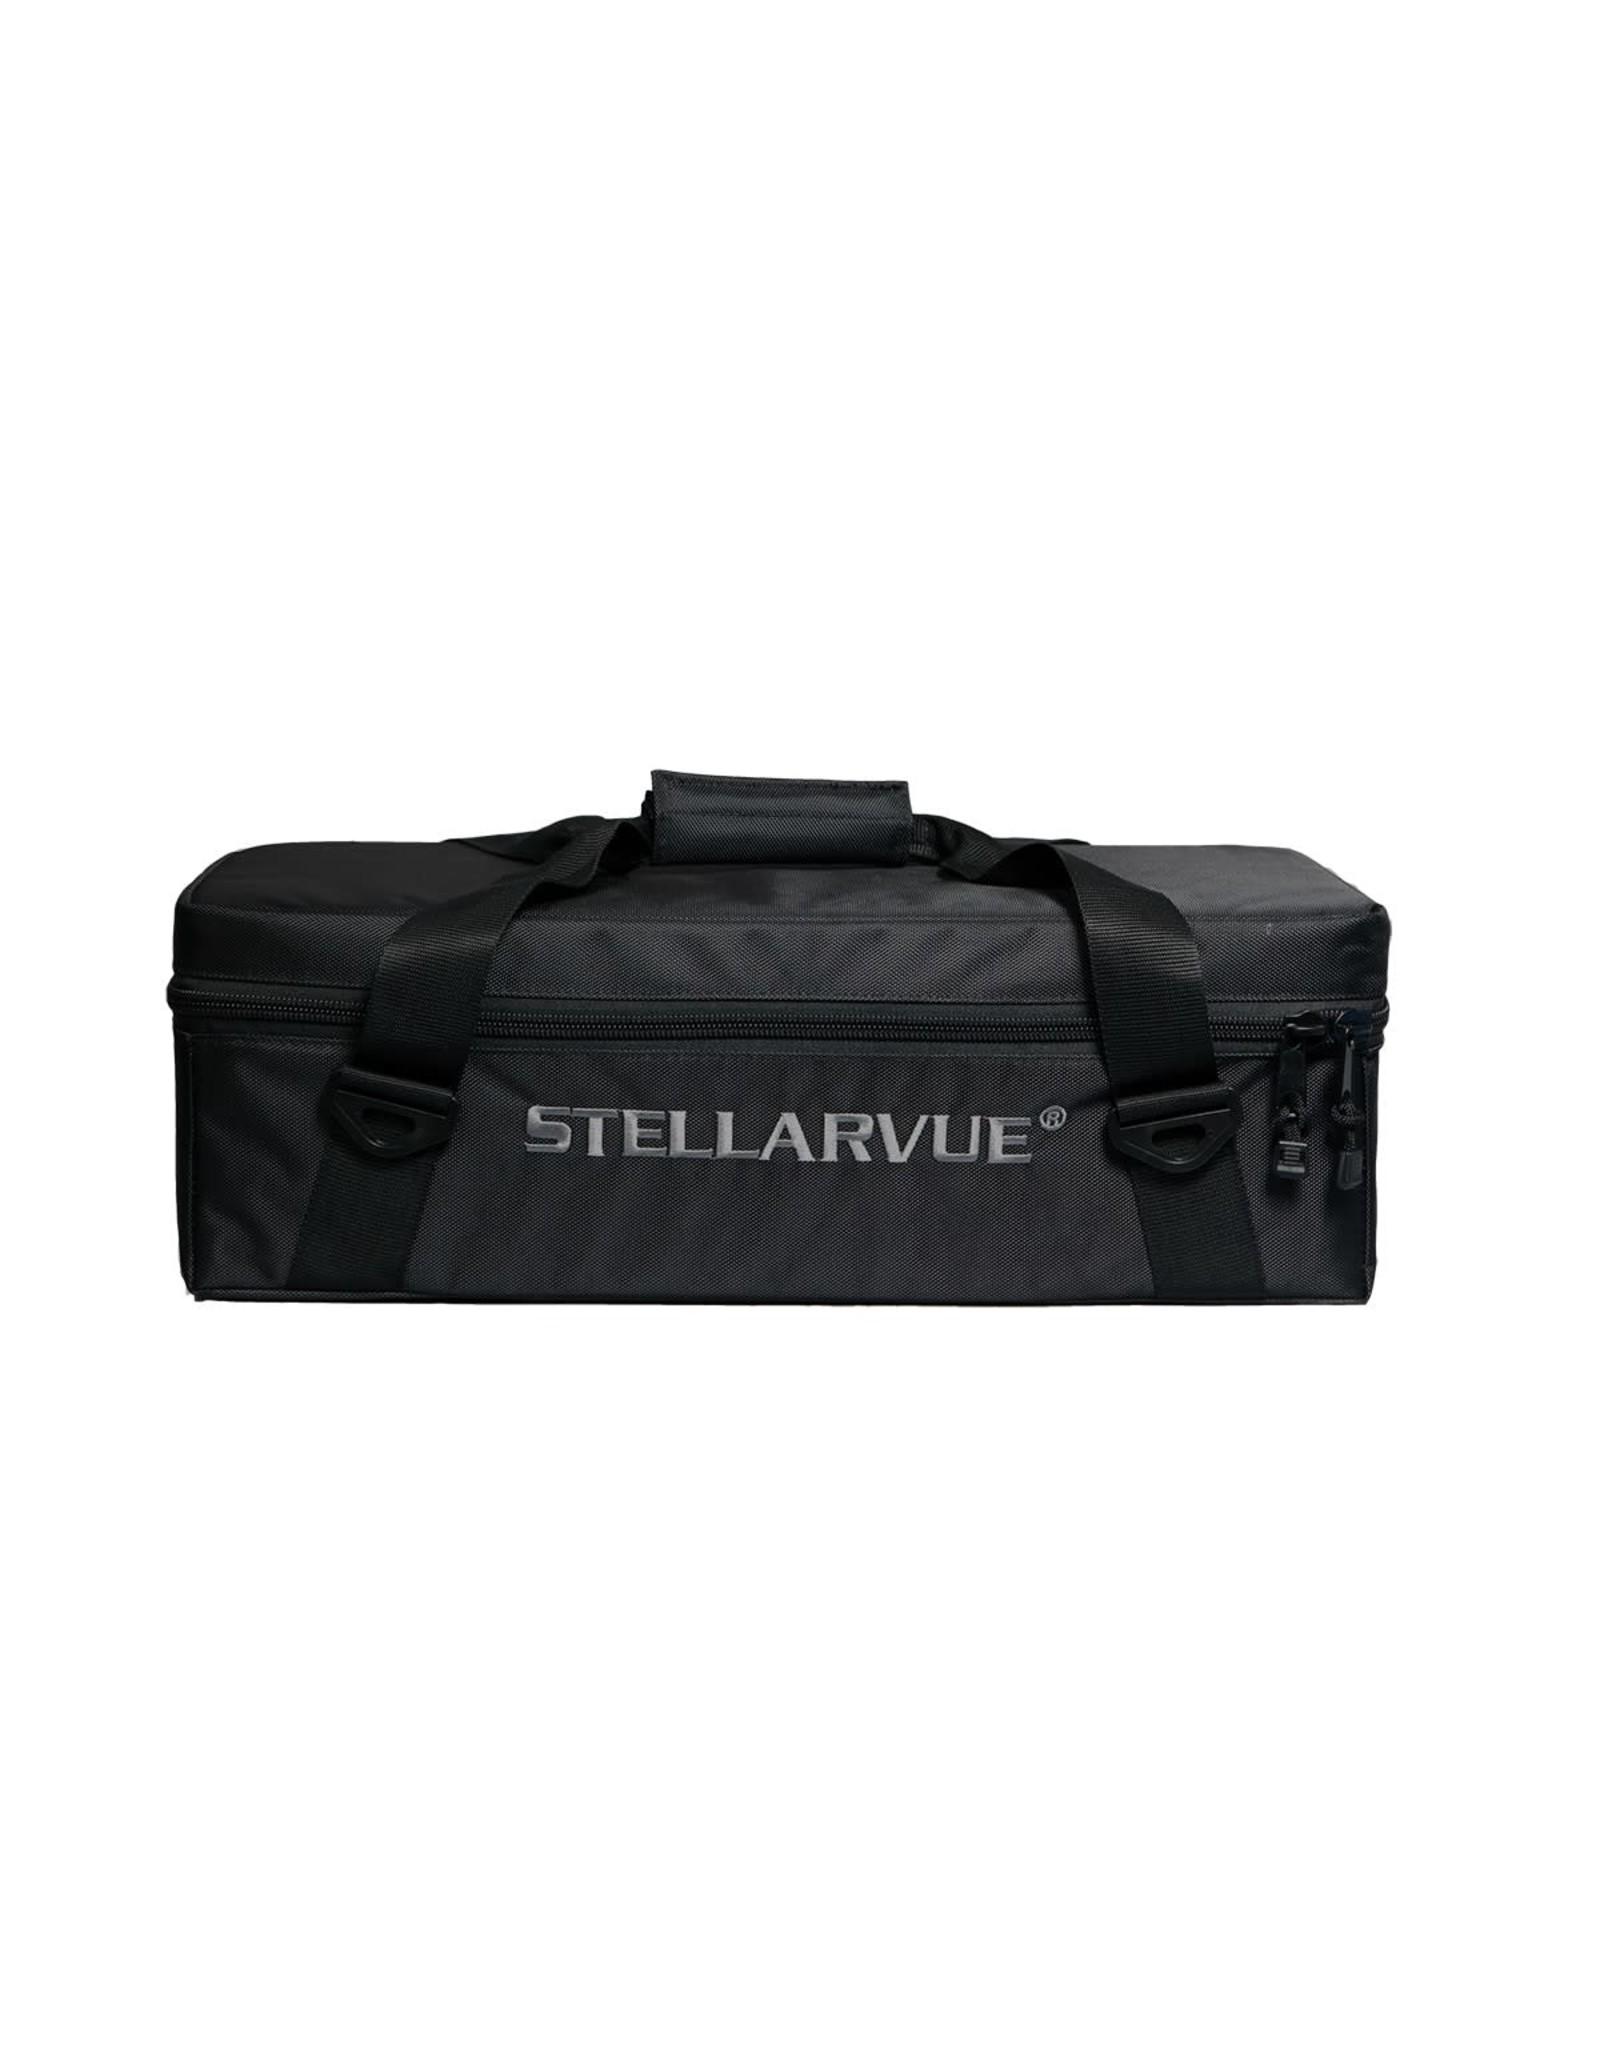 Stellarvue Stellarvue CC20 Case for 70-80mm Refractors